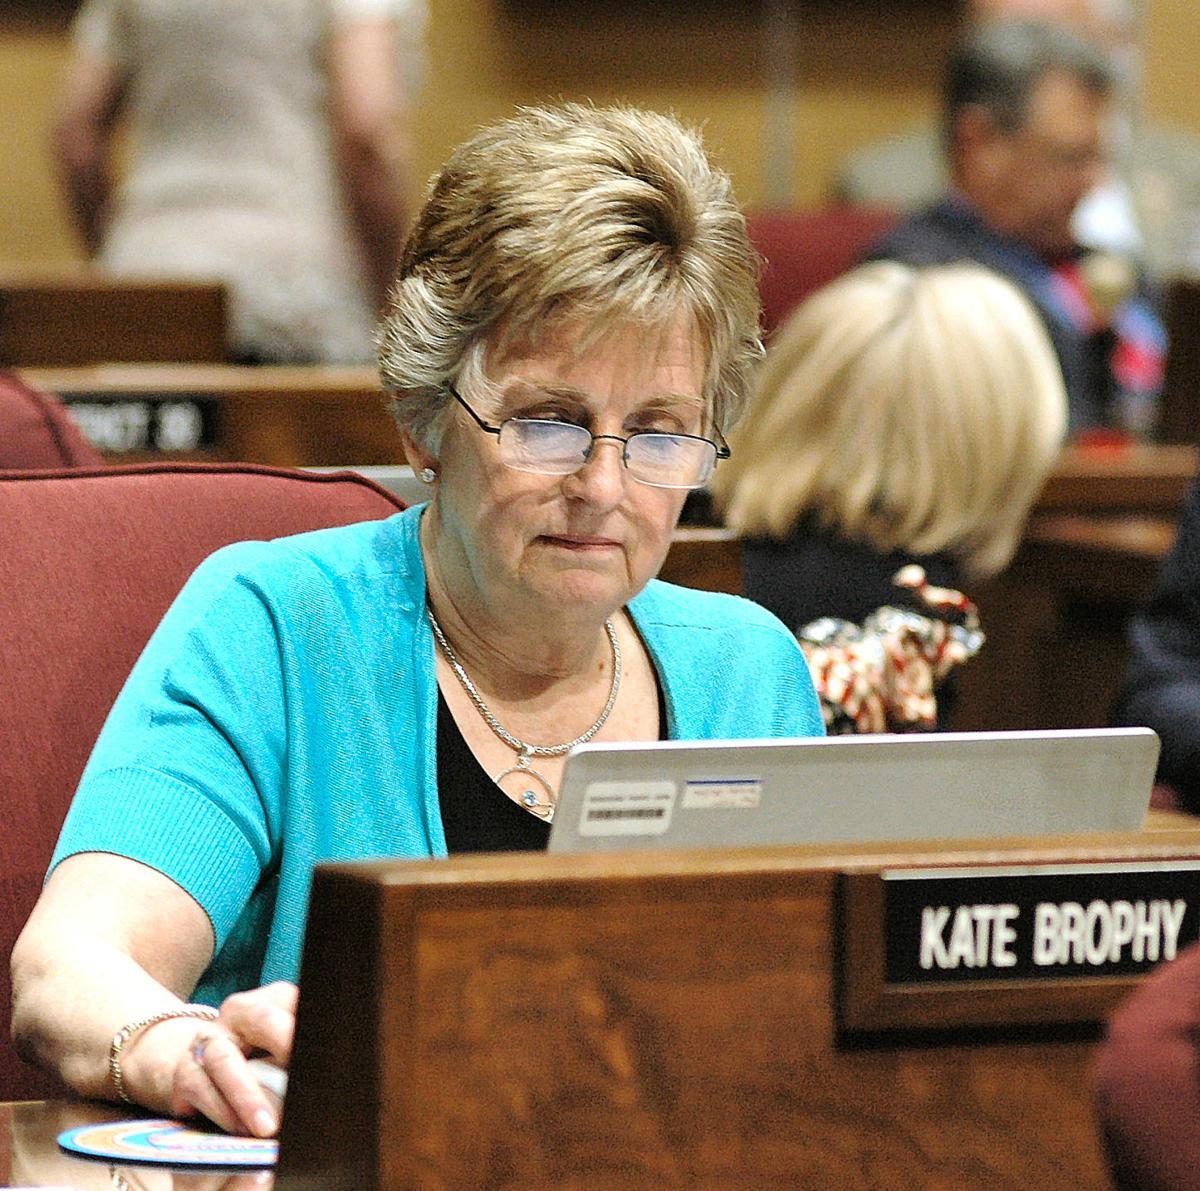 Senator Looks To Ease Burden For >> 2 Senate Bills Up For Hearings Will Help Ease Financial Burdens Of